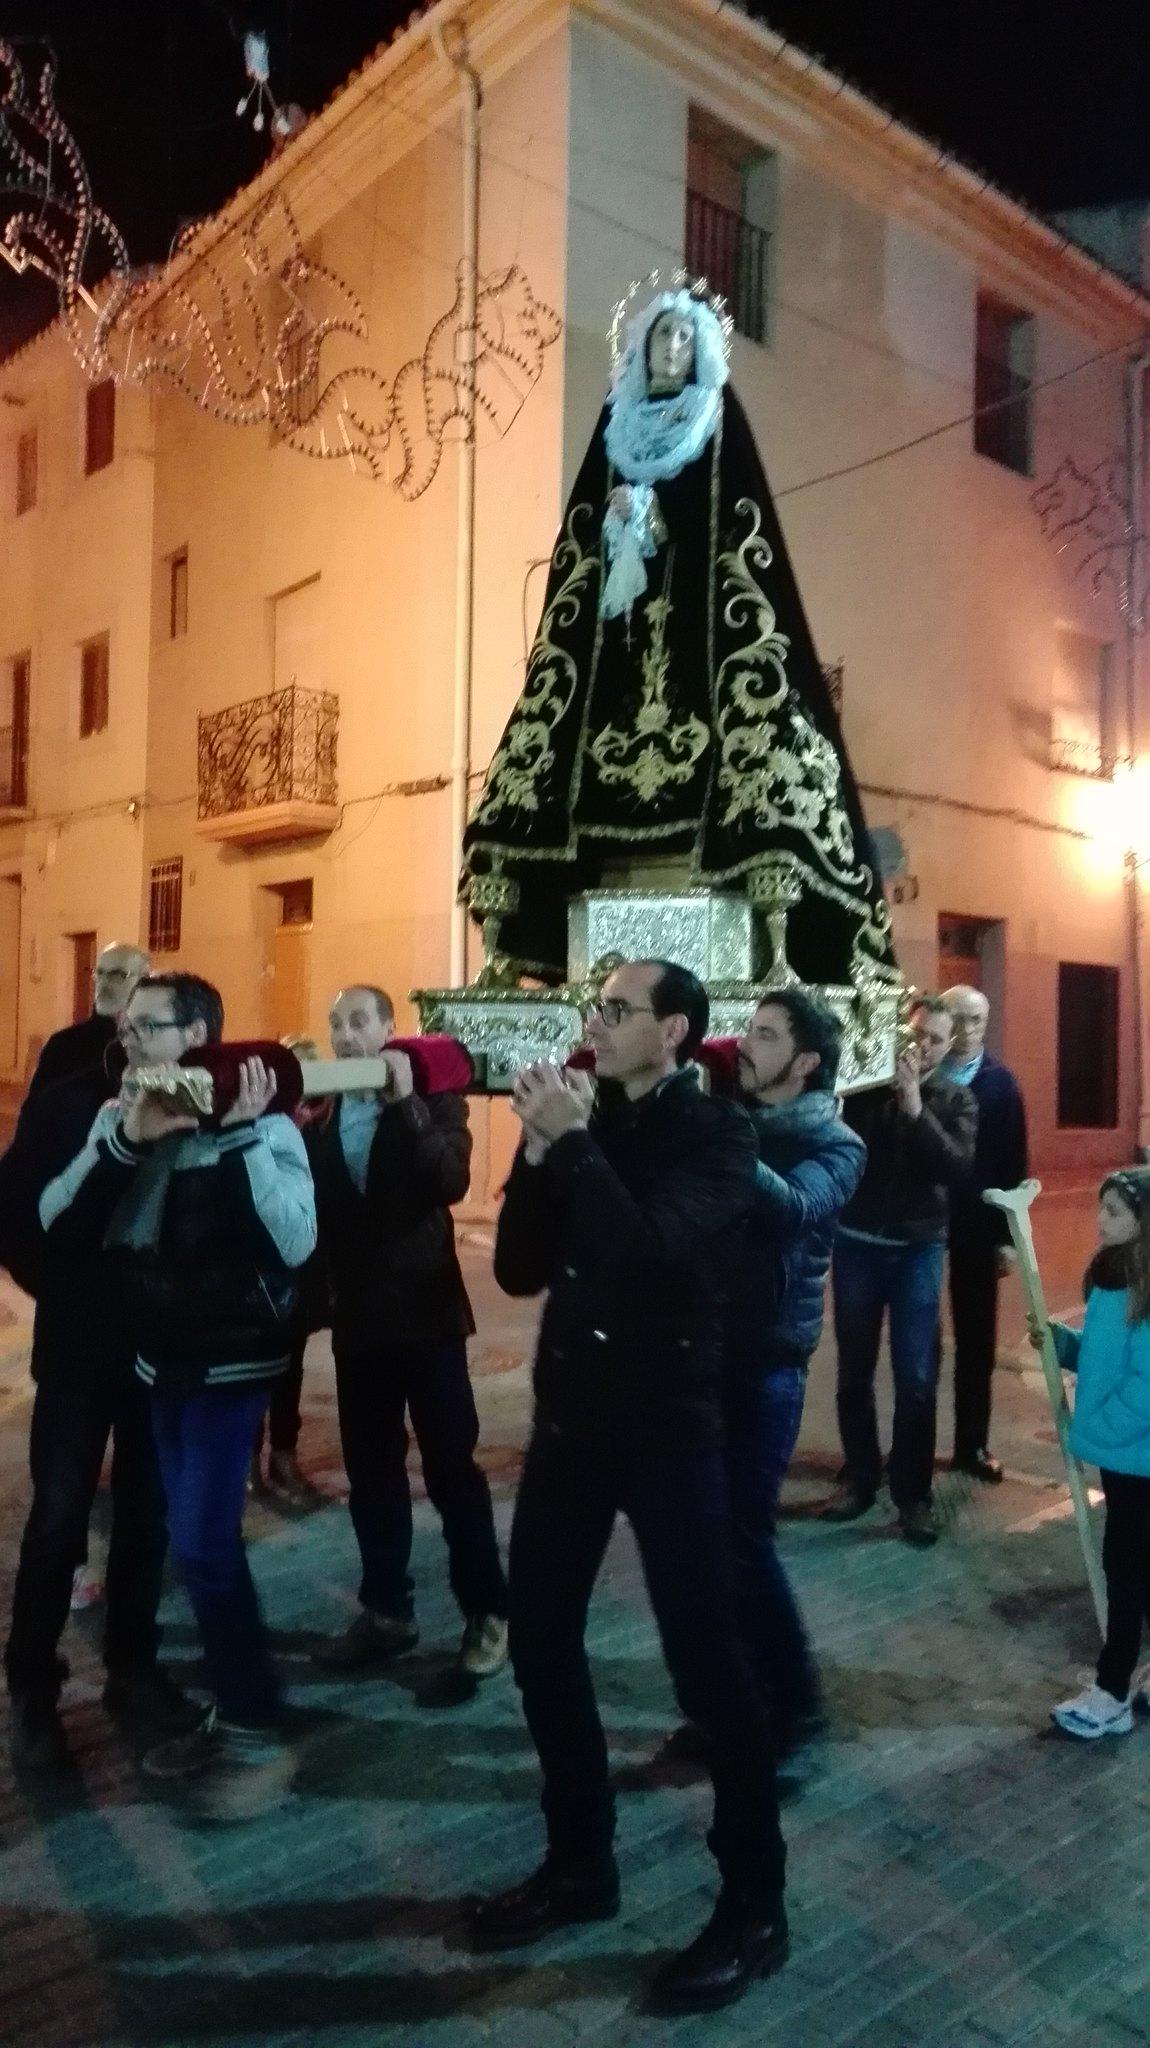 (2016-03-18) - VII Vía Crucis nocturno - Javier Romero Ripoll (072)